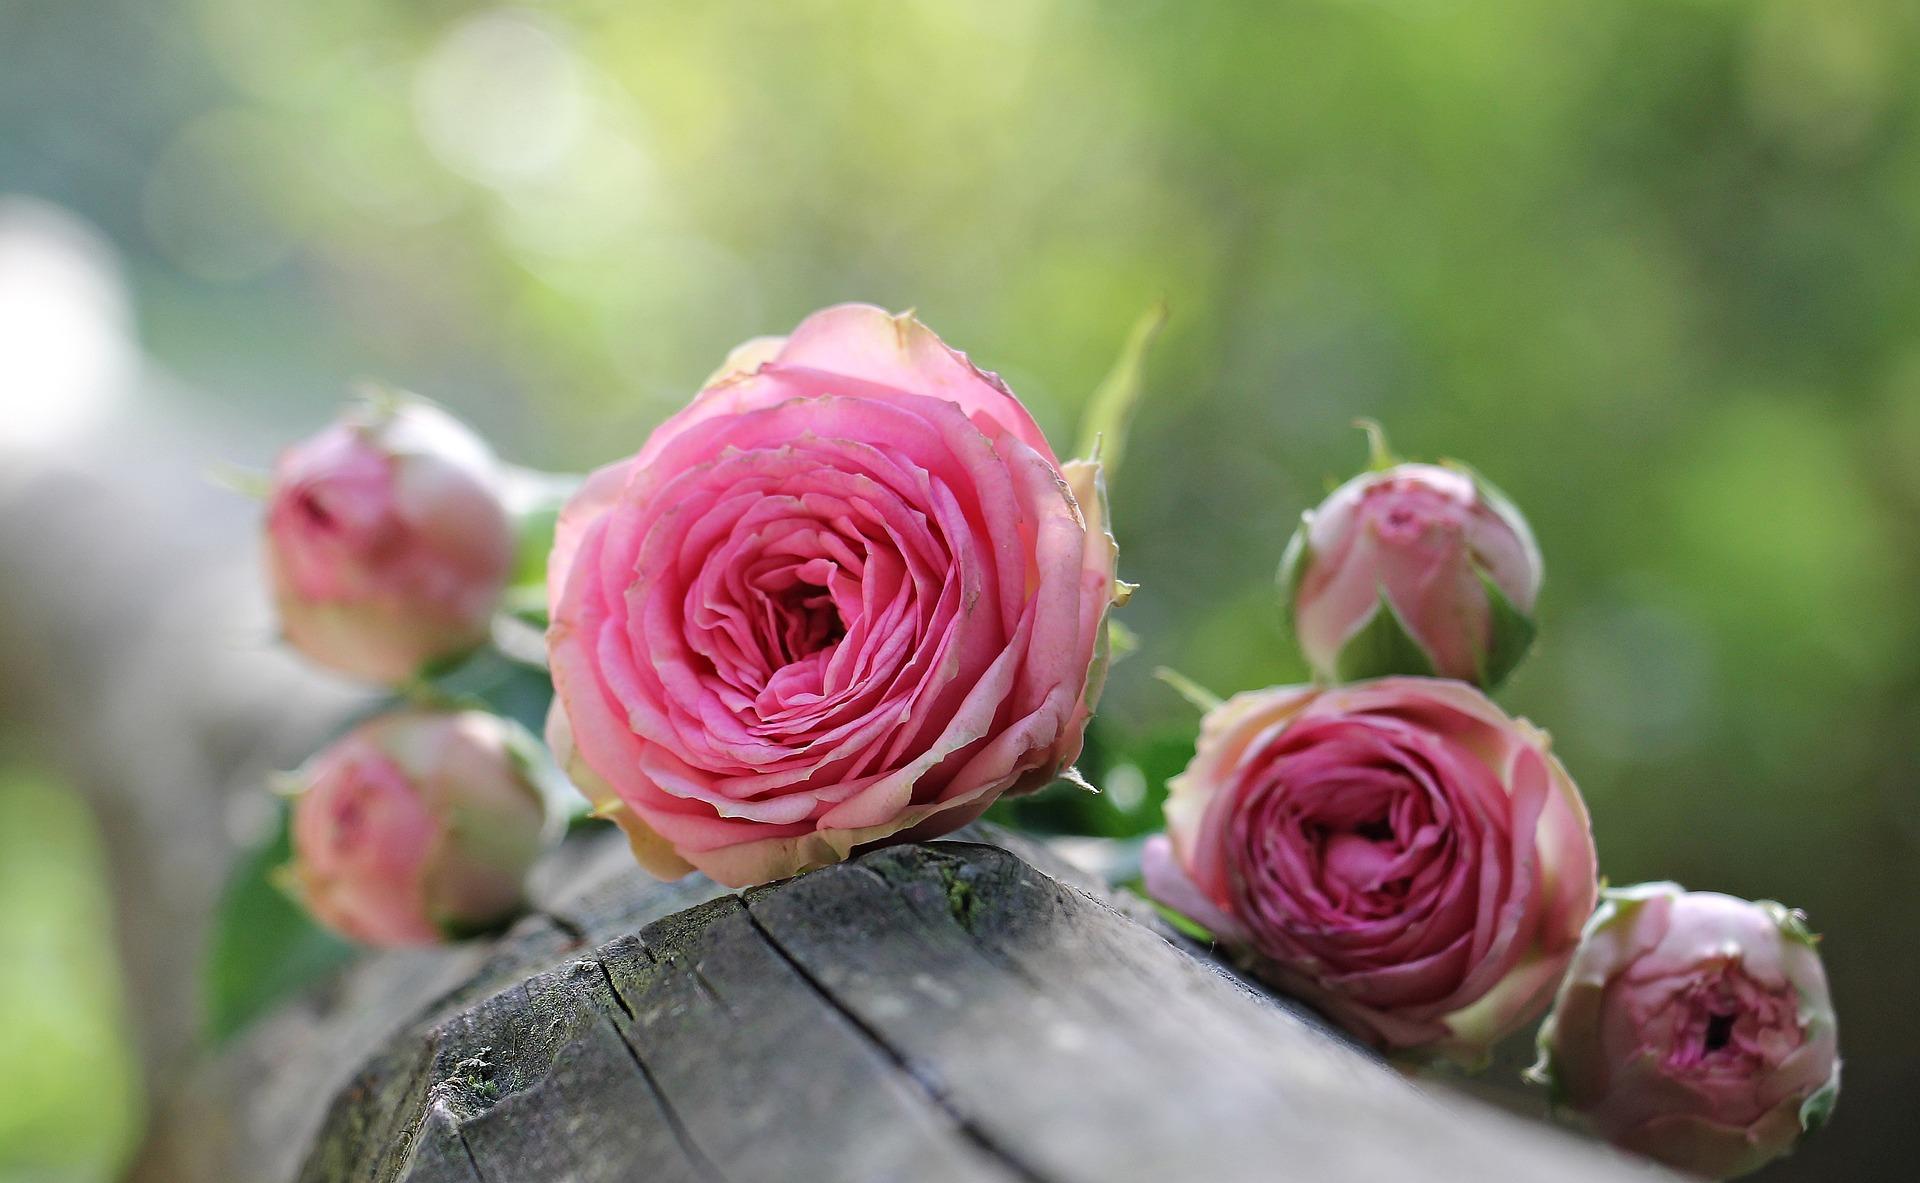 Dary přírody: Růže